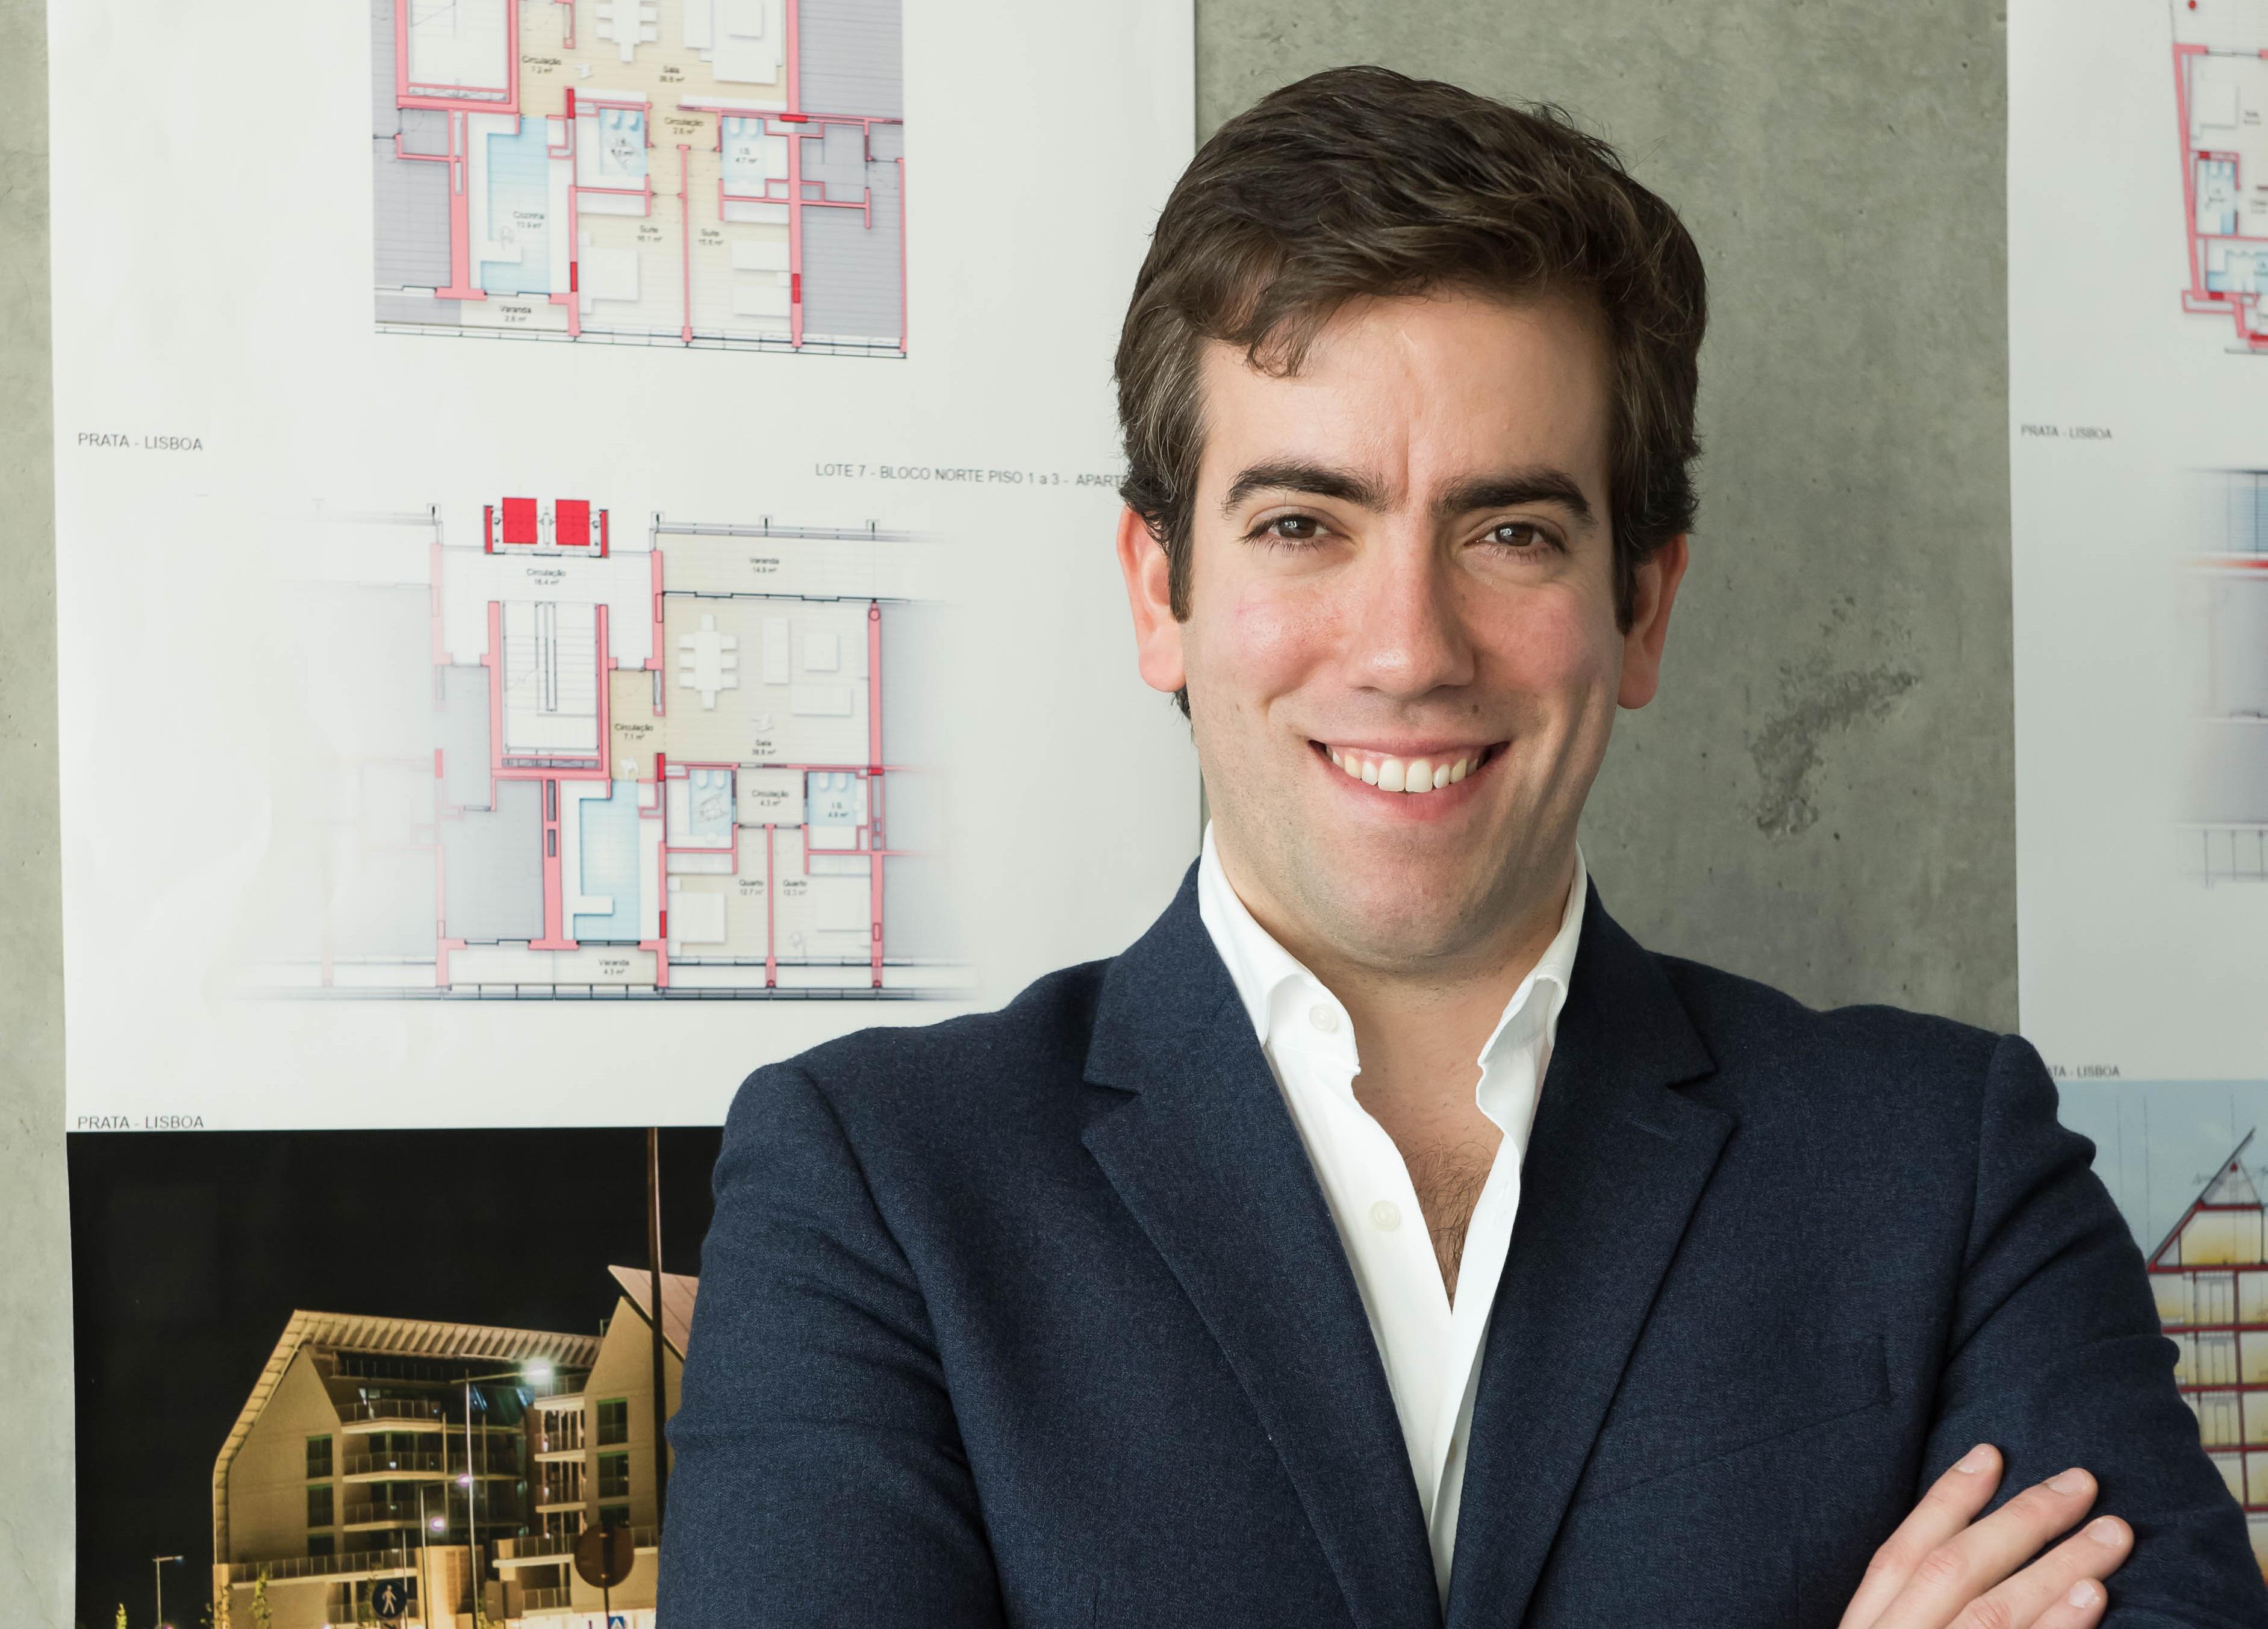 João Cabaça, CEO da VIC Properties / VIC Properties